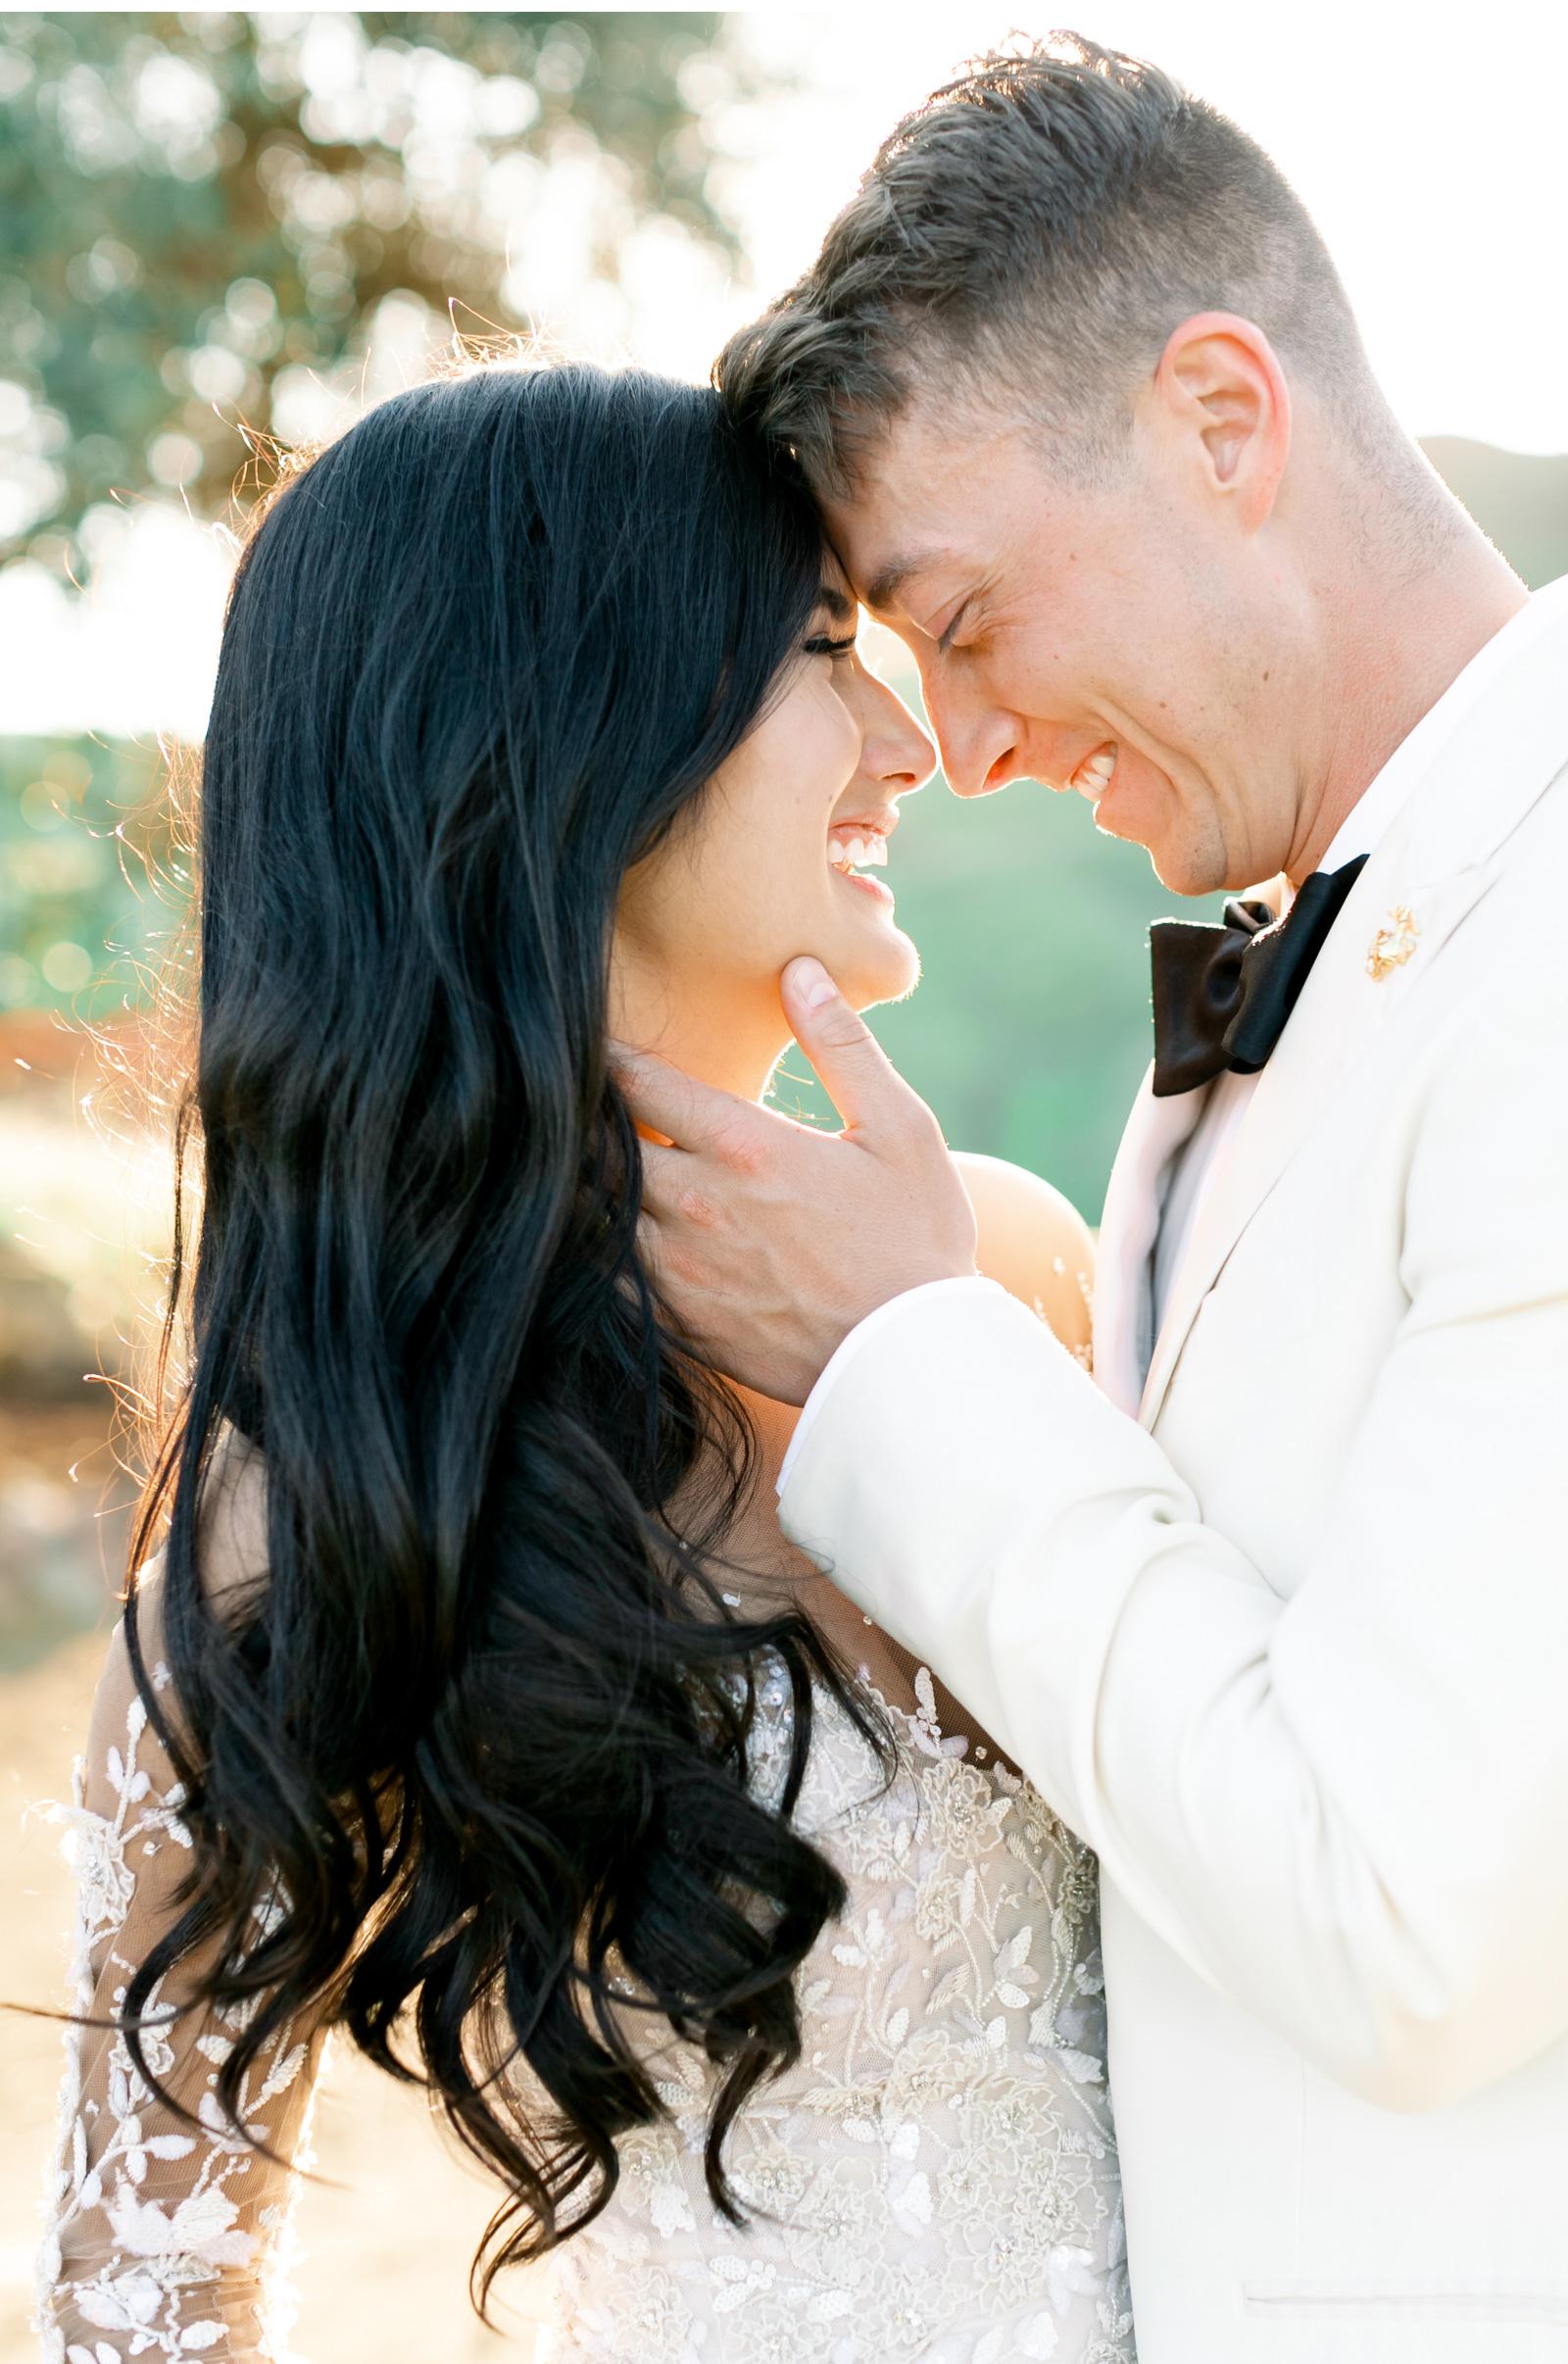 Style-Me-Pretty-Malibu-Wedding-Venues-Southern-California-Wedding-Photographer-Triunfo-Creek-Malibu-Photographer-Natalie-Schutt-Photography_08.jpg